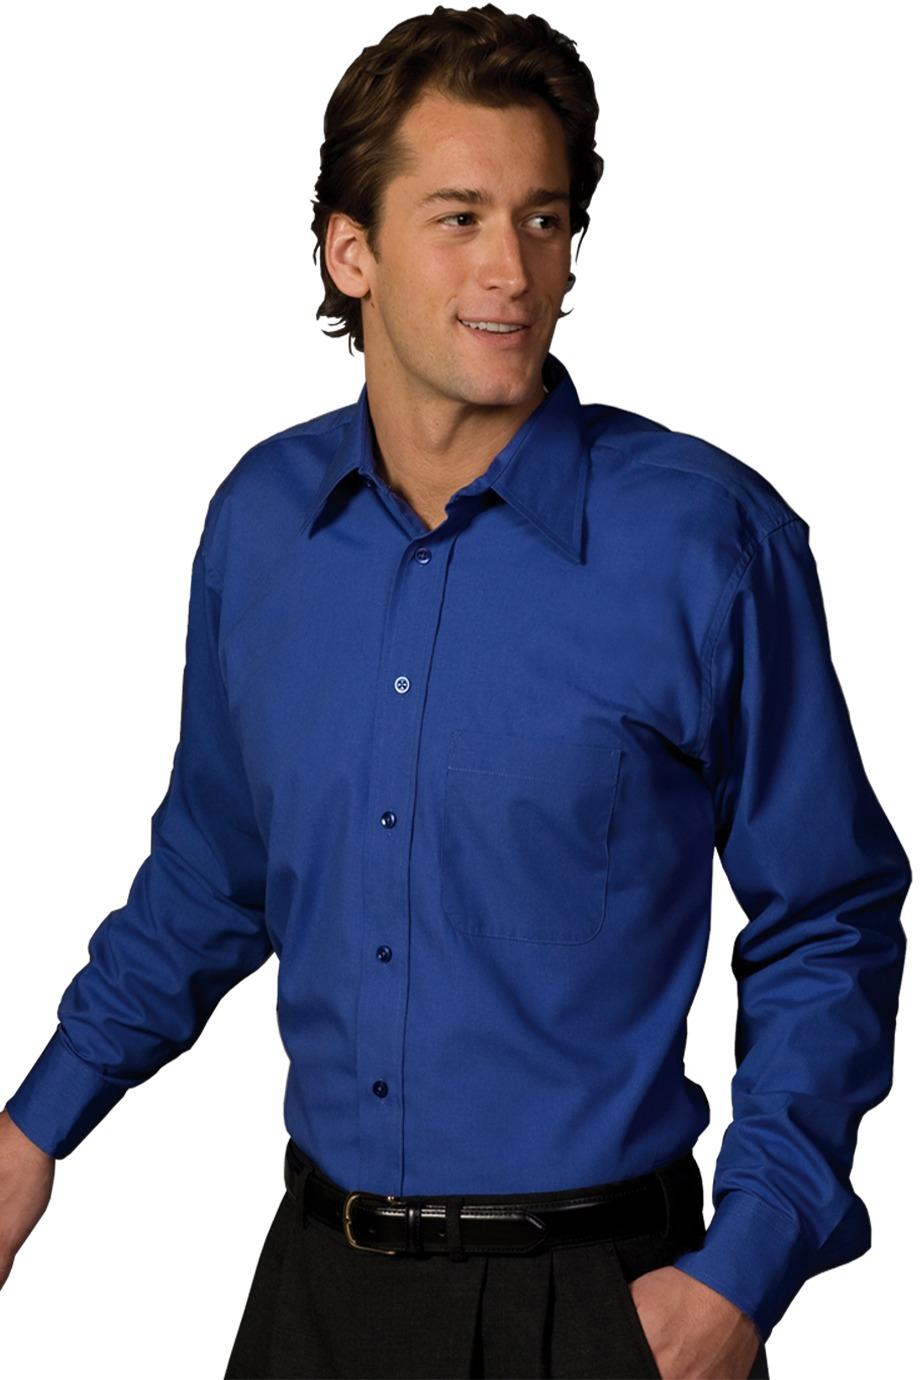 Edwards Garment 1287 - Men's Easy Care Poplin Point Collar Shirt